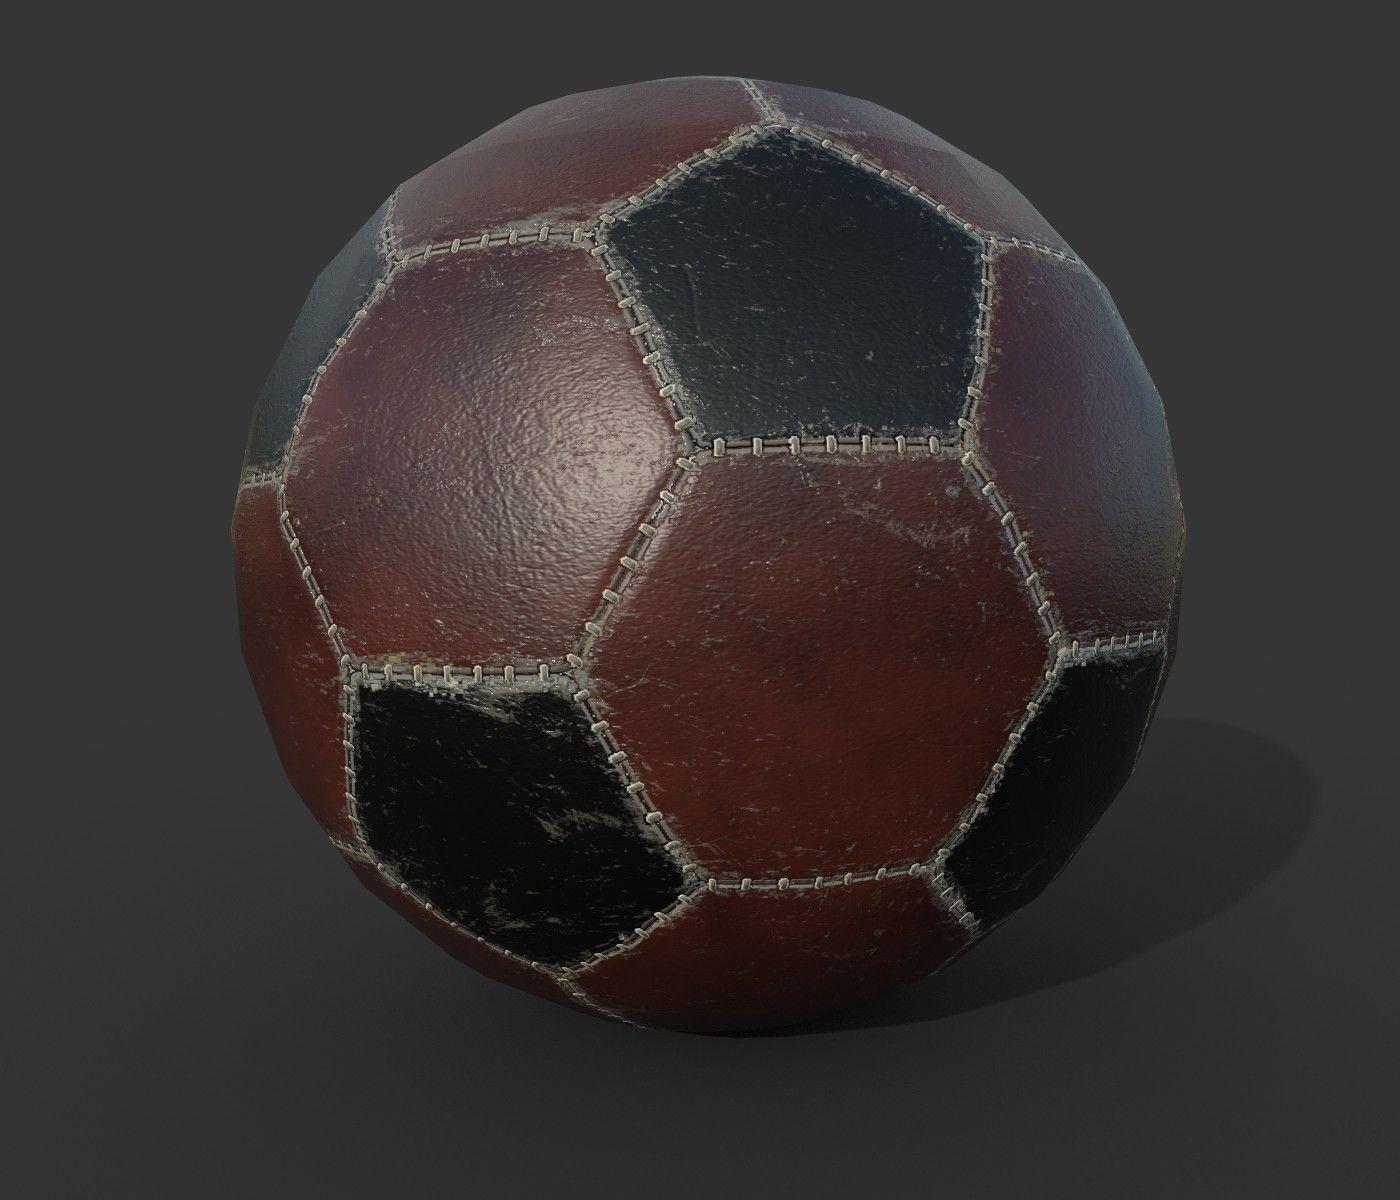 Soccer Ball PBR